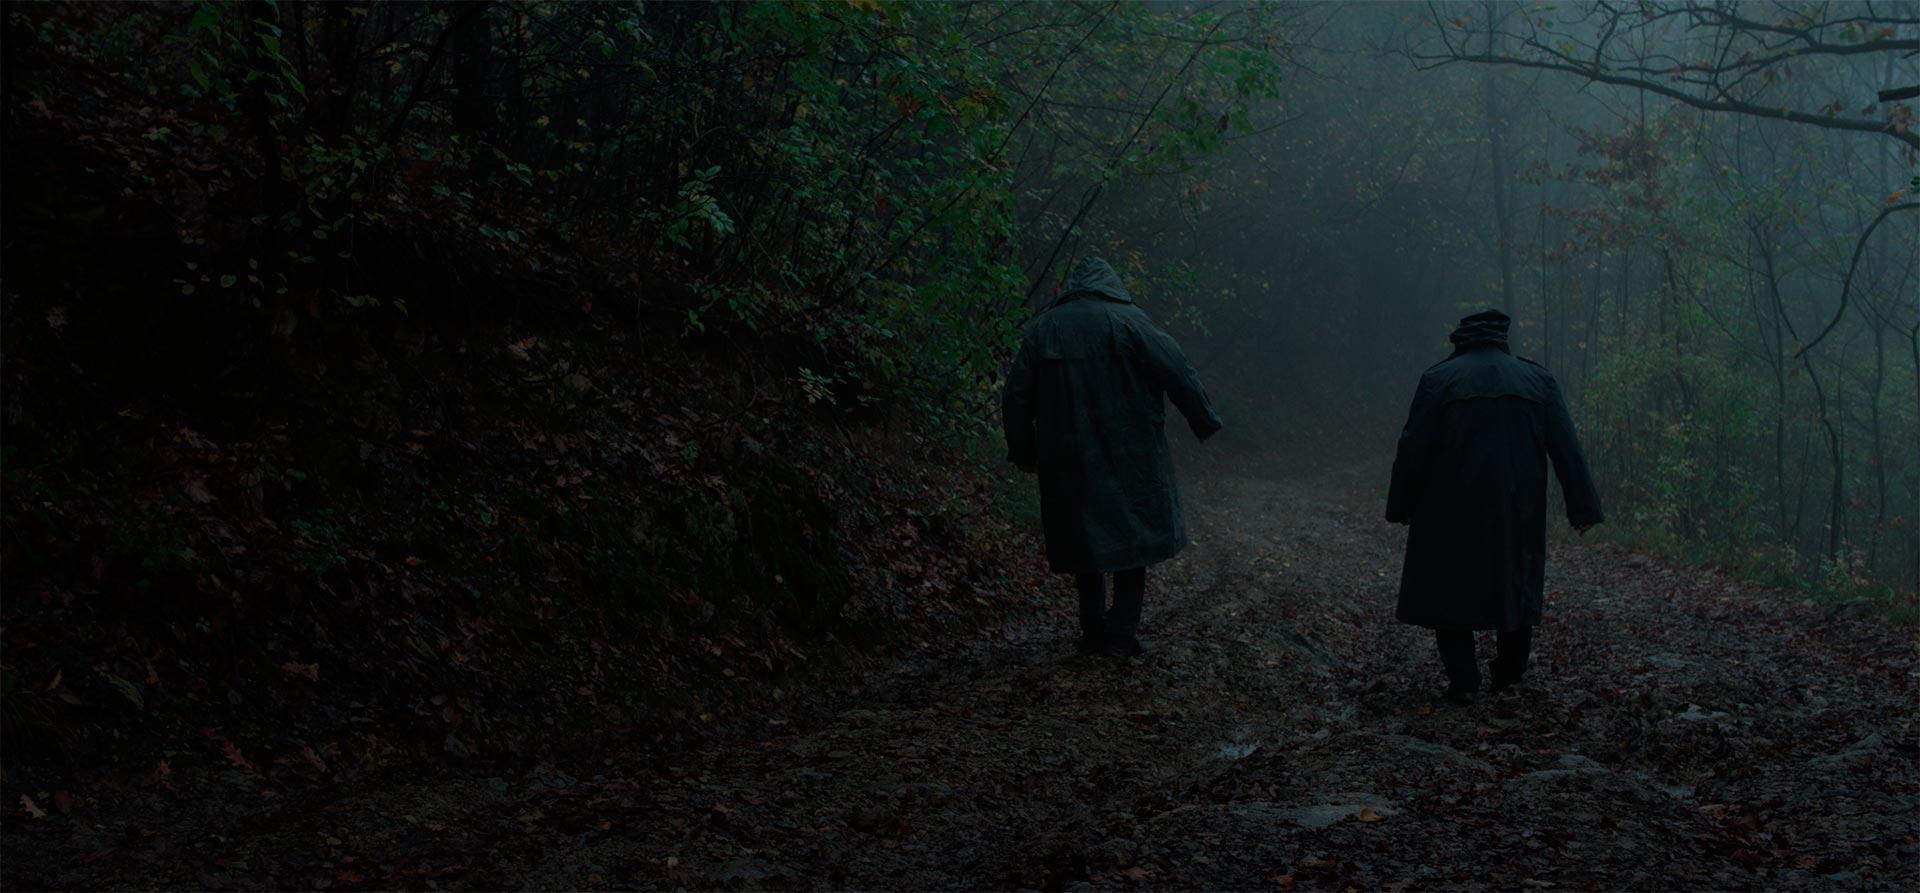 кадр из кинофильма «Брат Дэян»